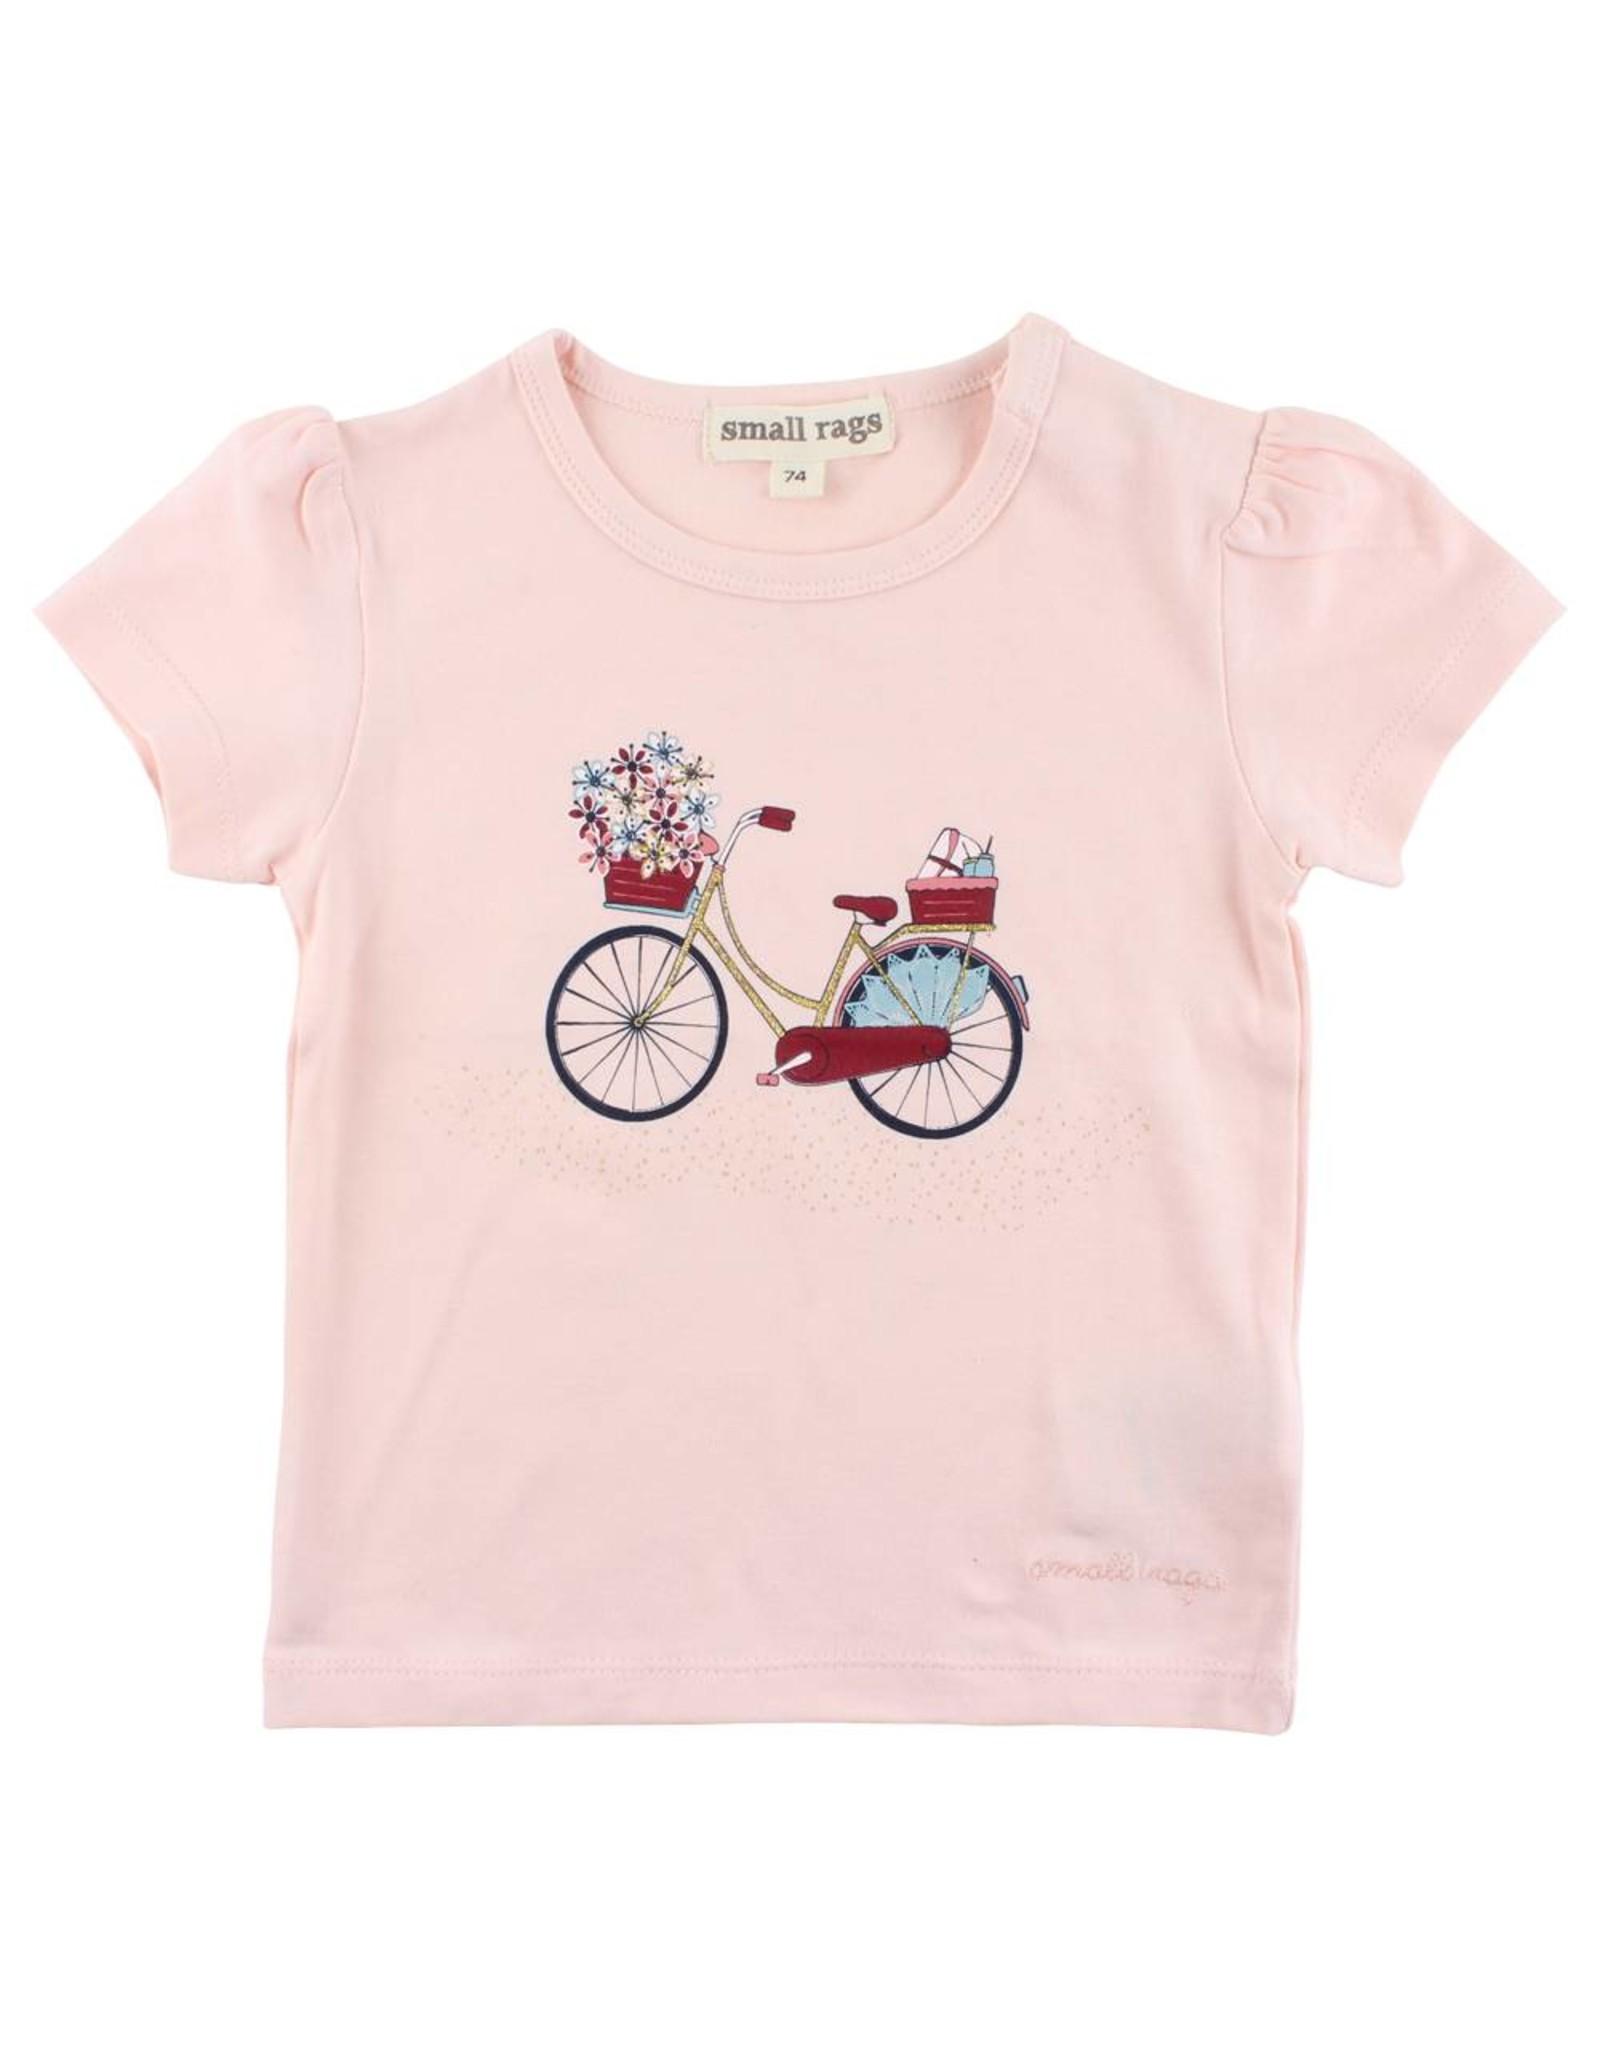 Small Rags Small Rags T-shirt Bike Pearl Blush